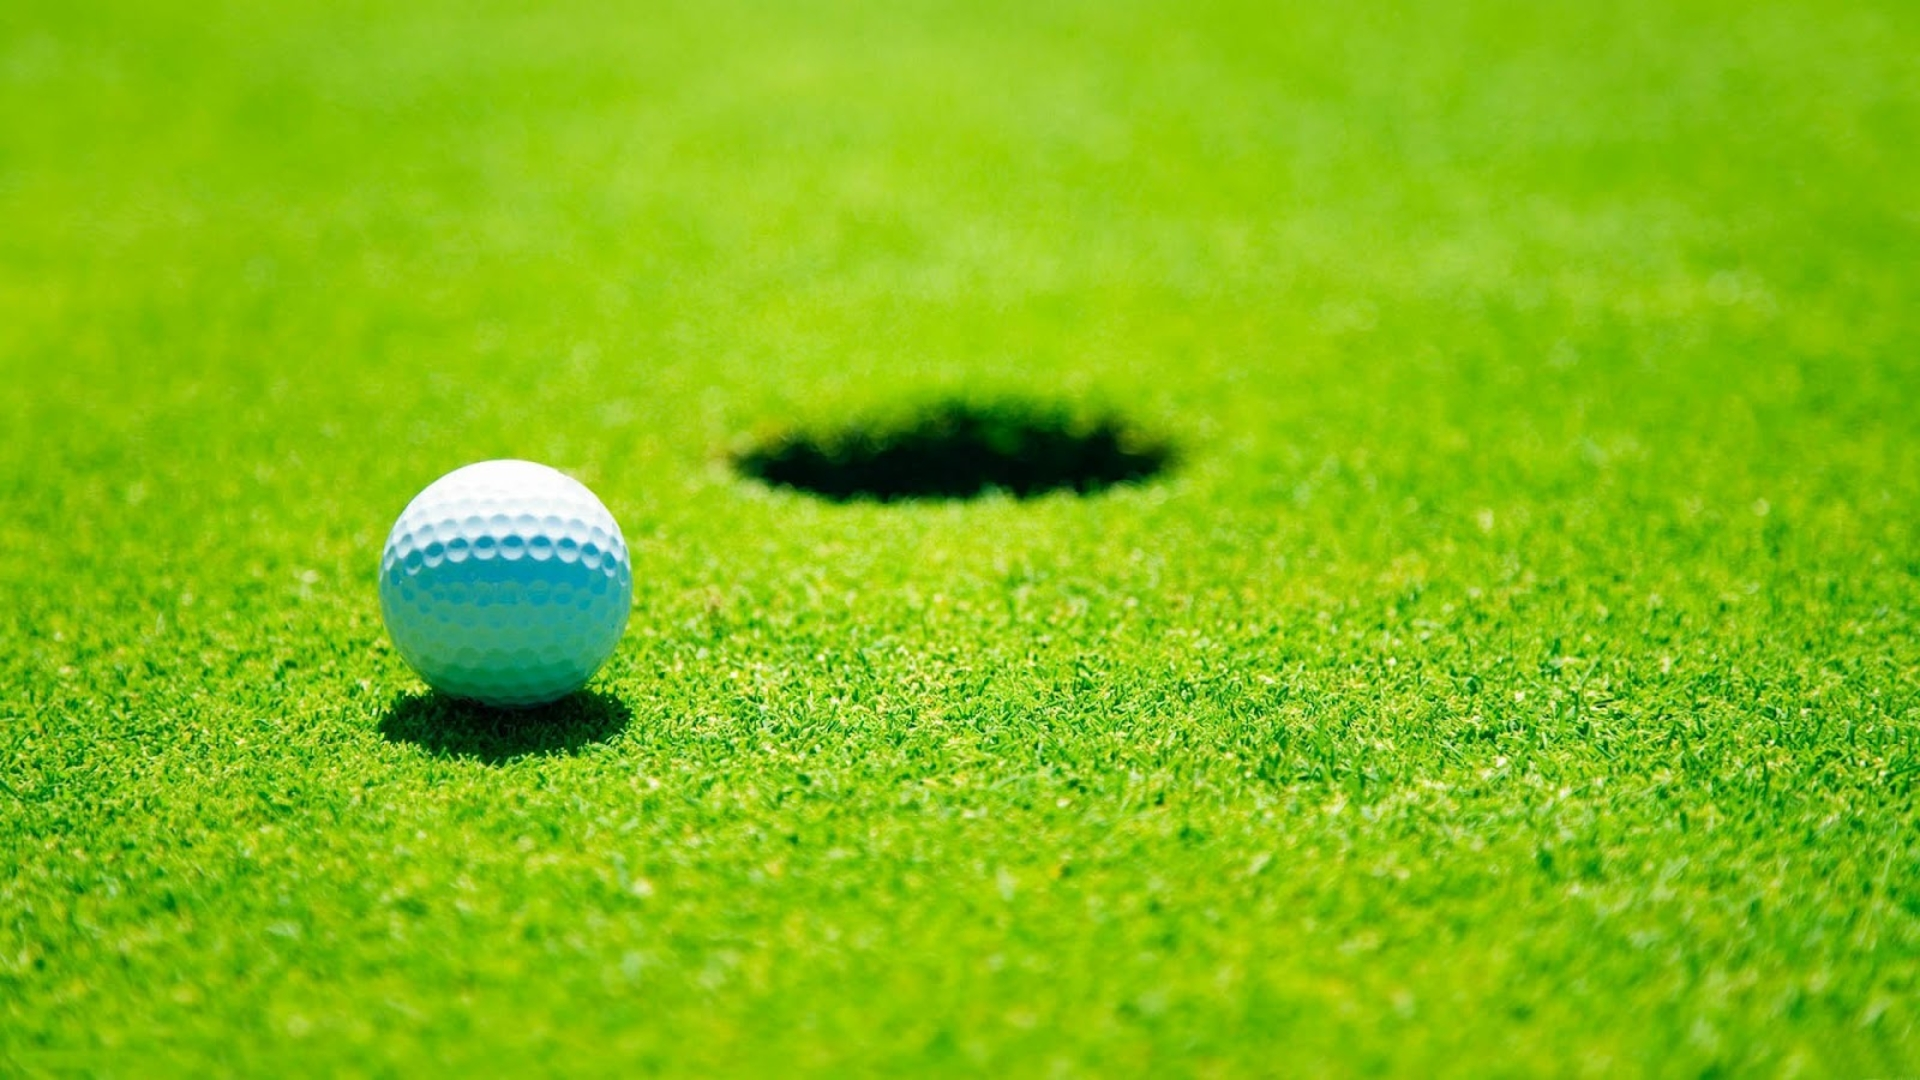 1920x1080 pixel Desktop Wallpapers Golf Sports Backgrounds Wallpaper 1920x1080